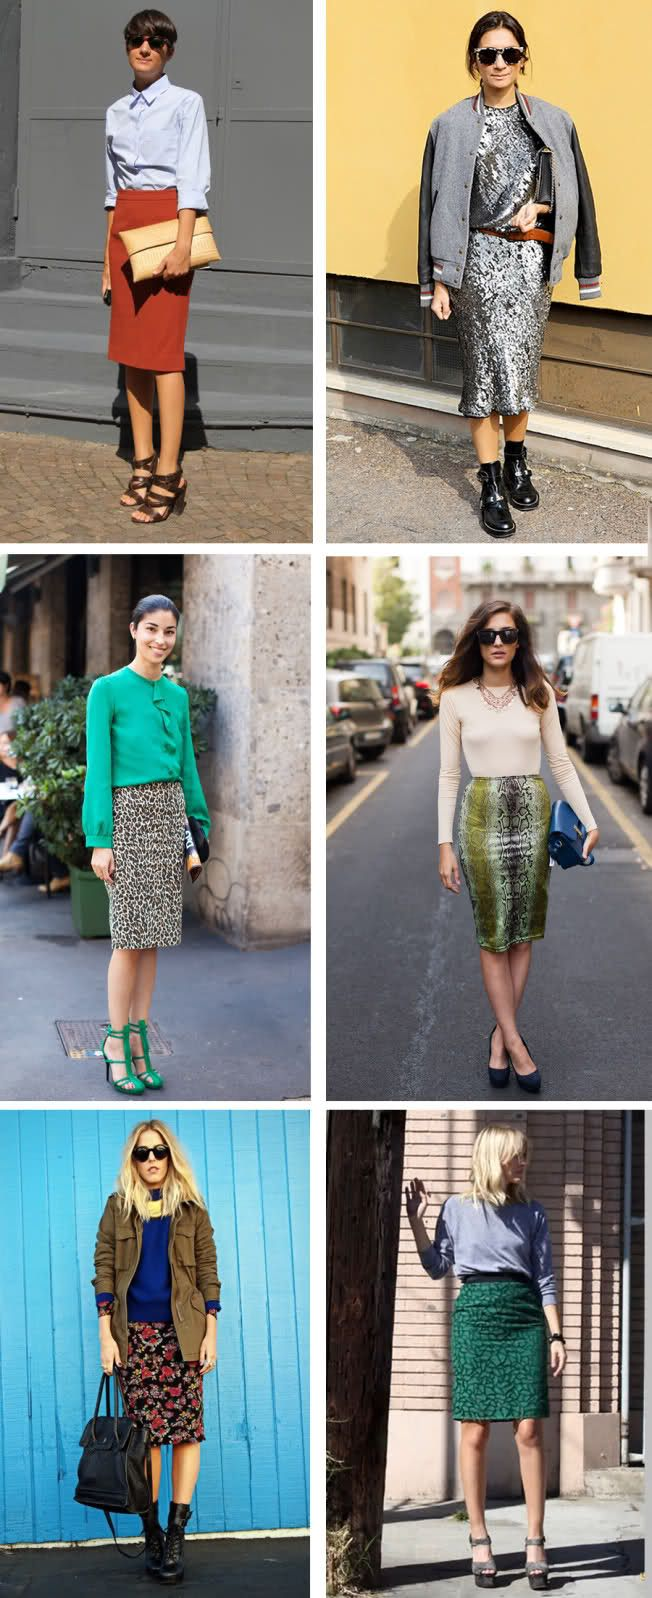 The Pencil Skirt Revolution.